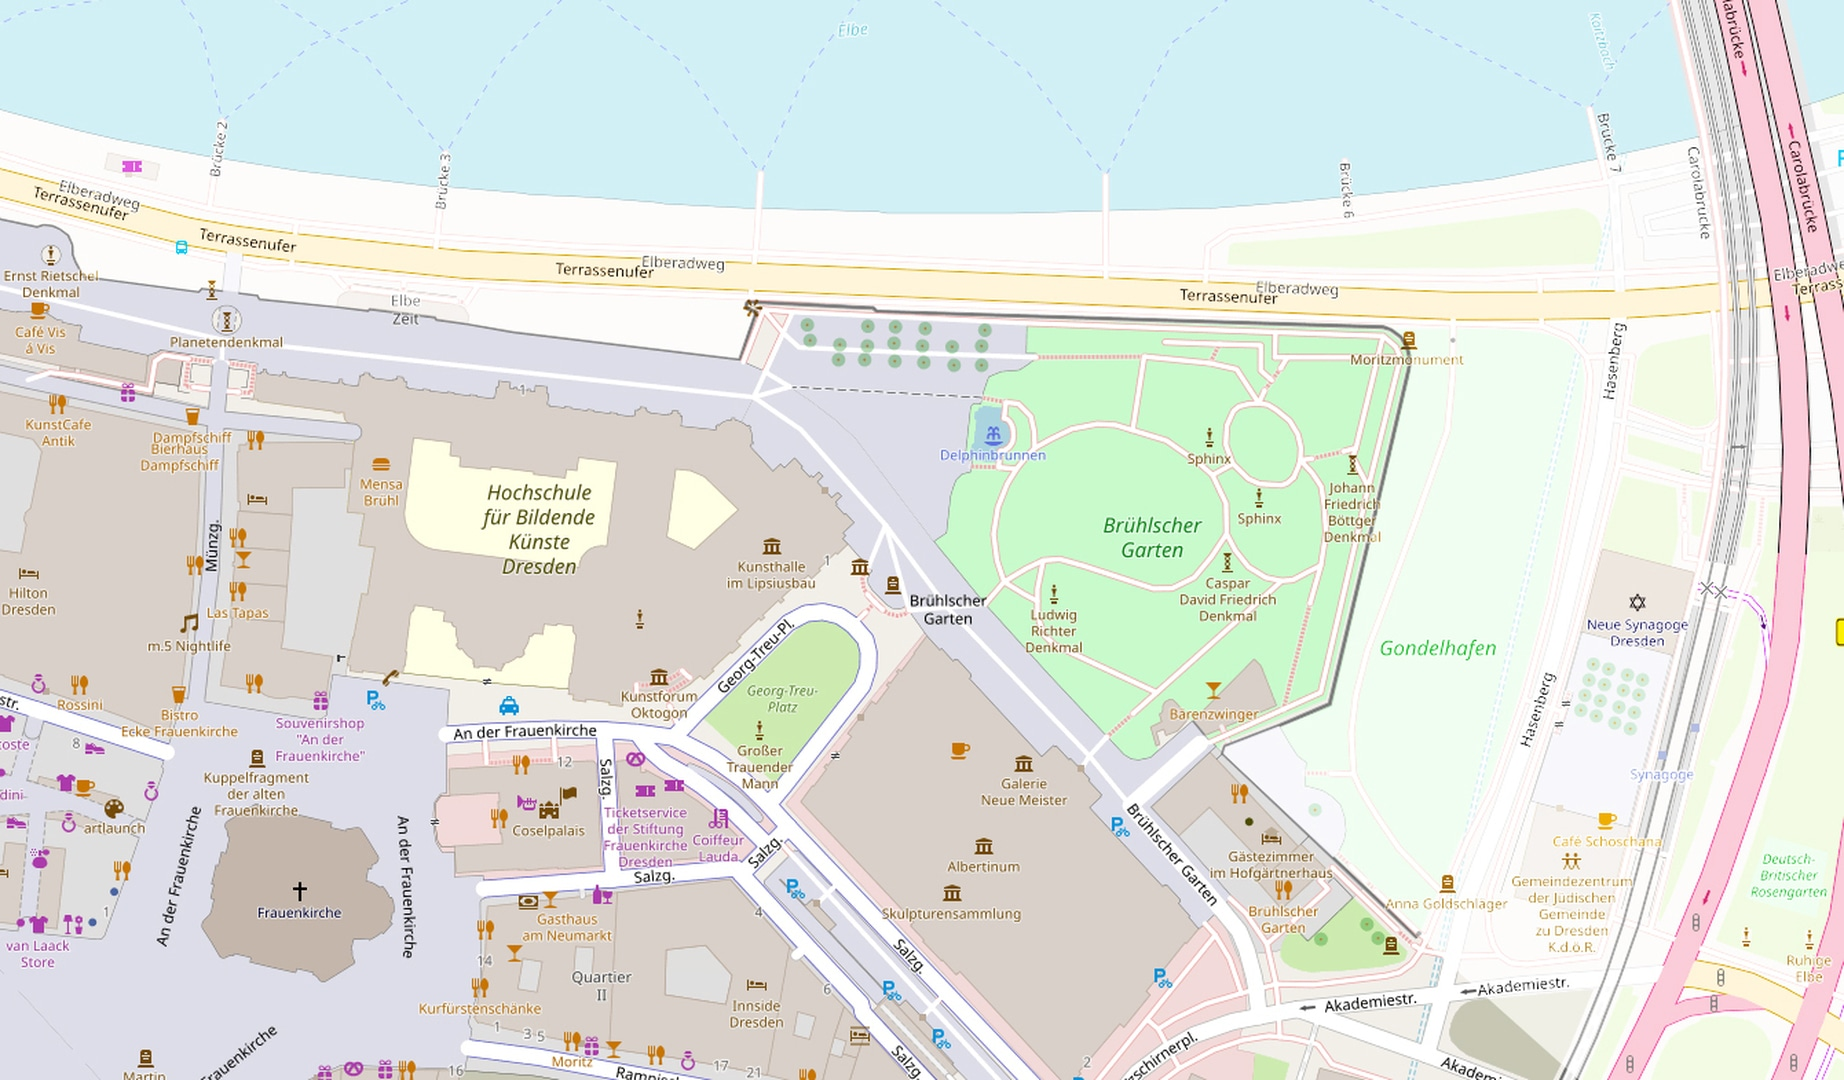 2019-12-19-11_46_16-OpenStreetMap-Deutschland_-Karteb.jpg